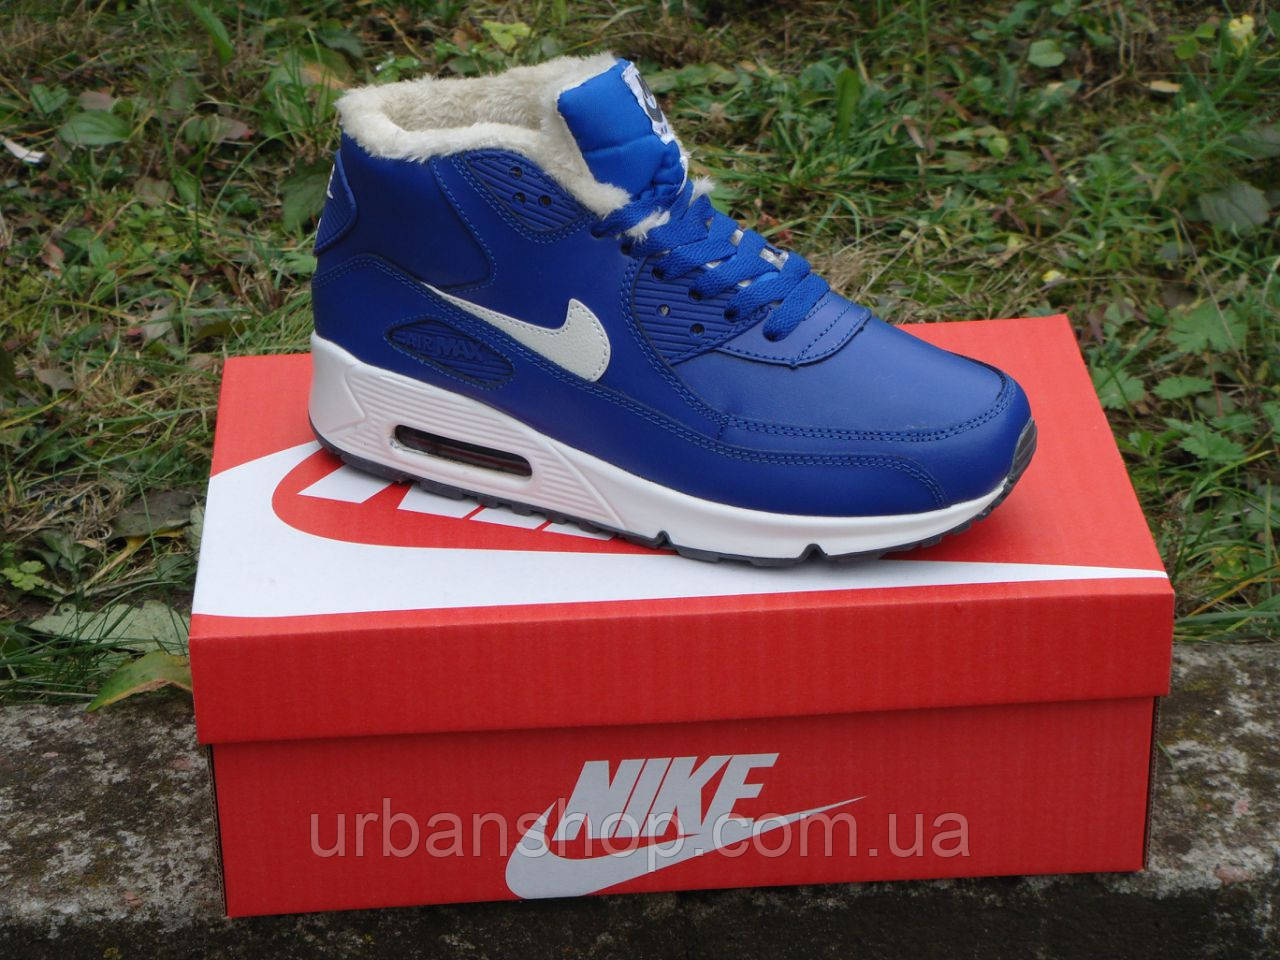 Зимние кроссовки Nike Air Max 90 blue 41-45 рр